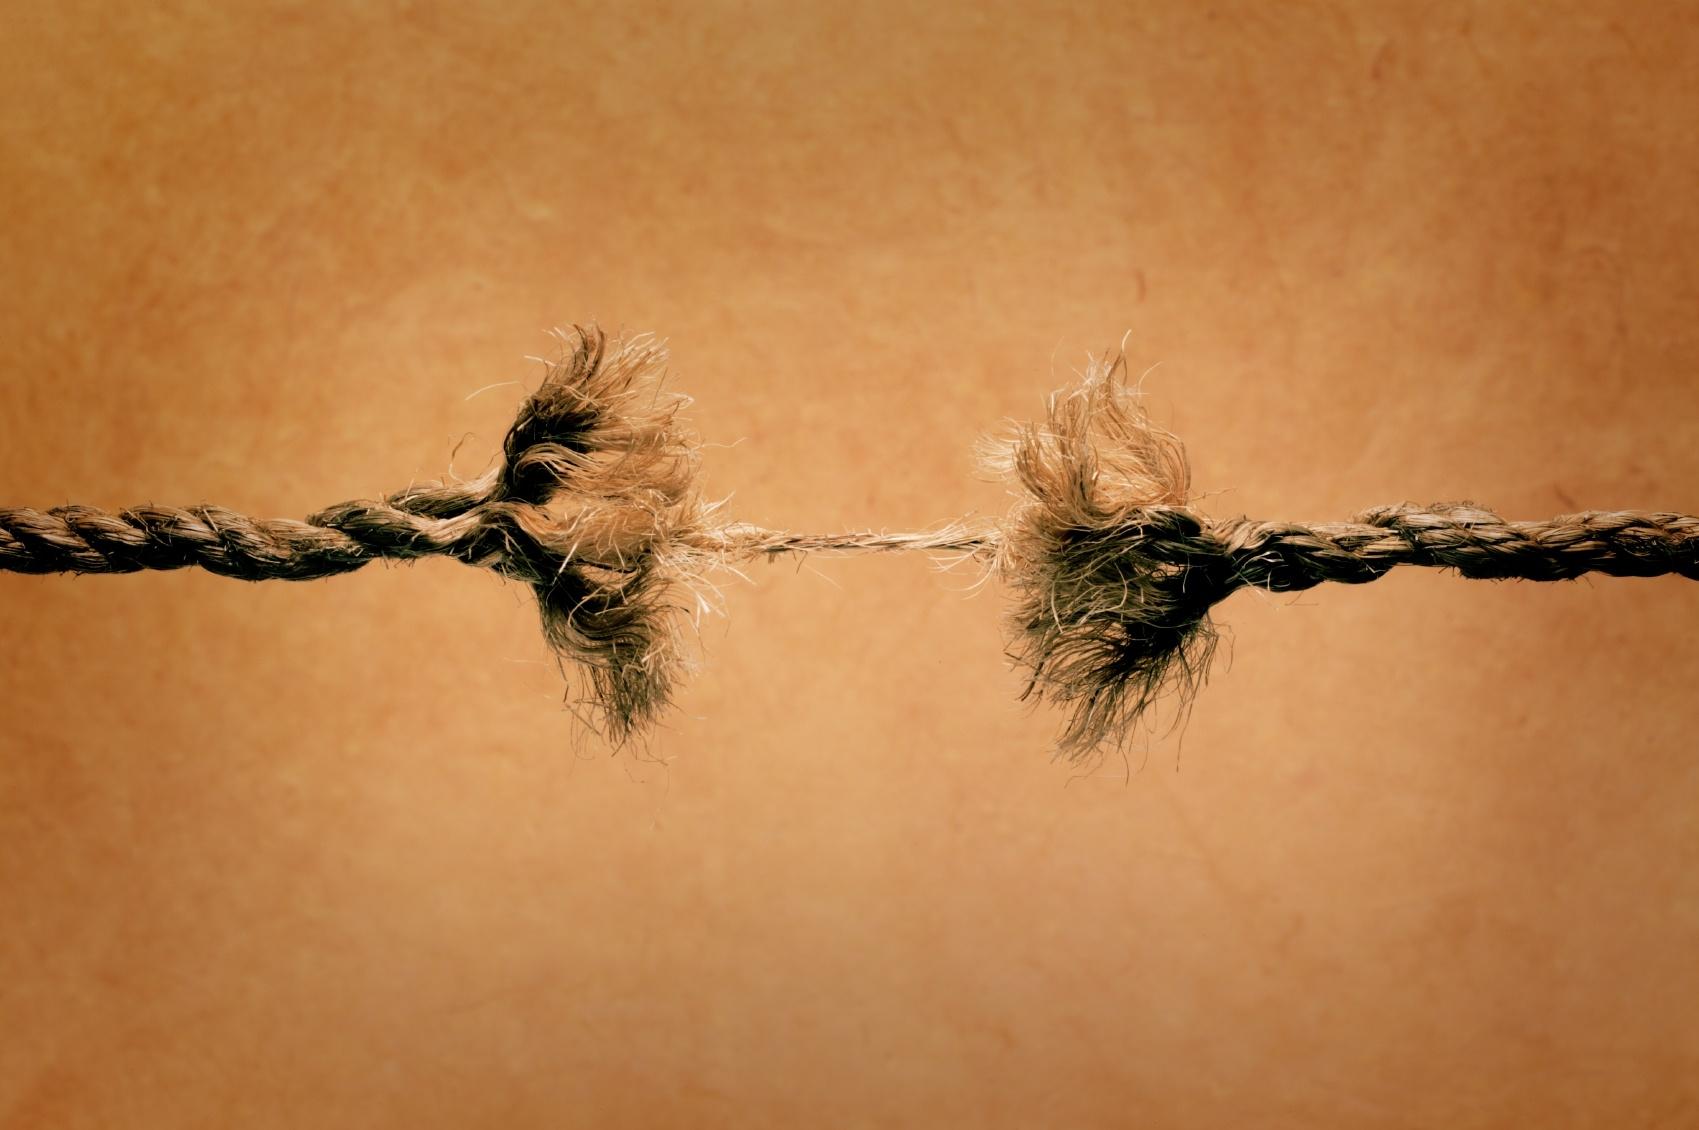 Книга Эрика Бертрана Ларссена «На пределе. Неделя без жалости к себе»